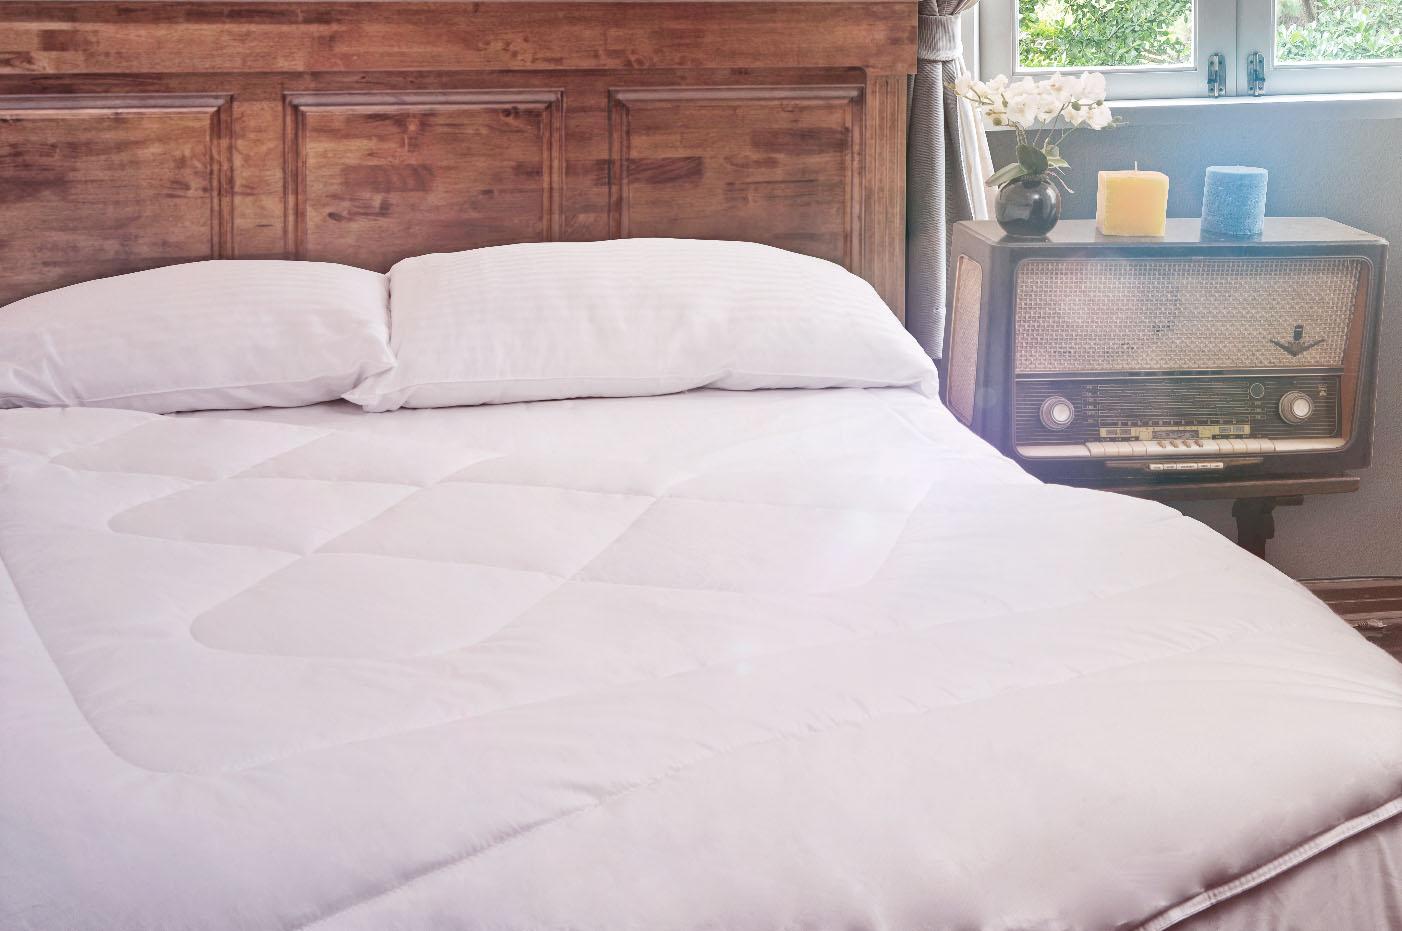 100 cotton 180 threads duvet comforter white sweetdreams for Pima cotton comforter